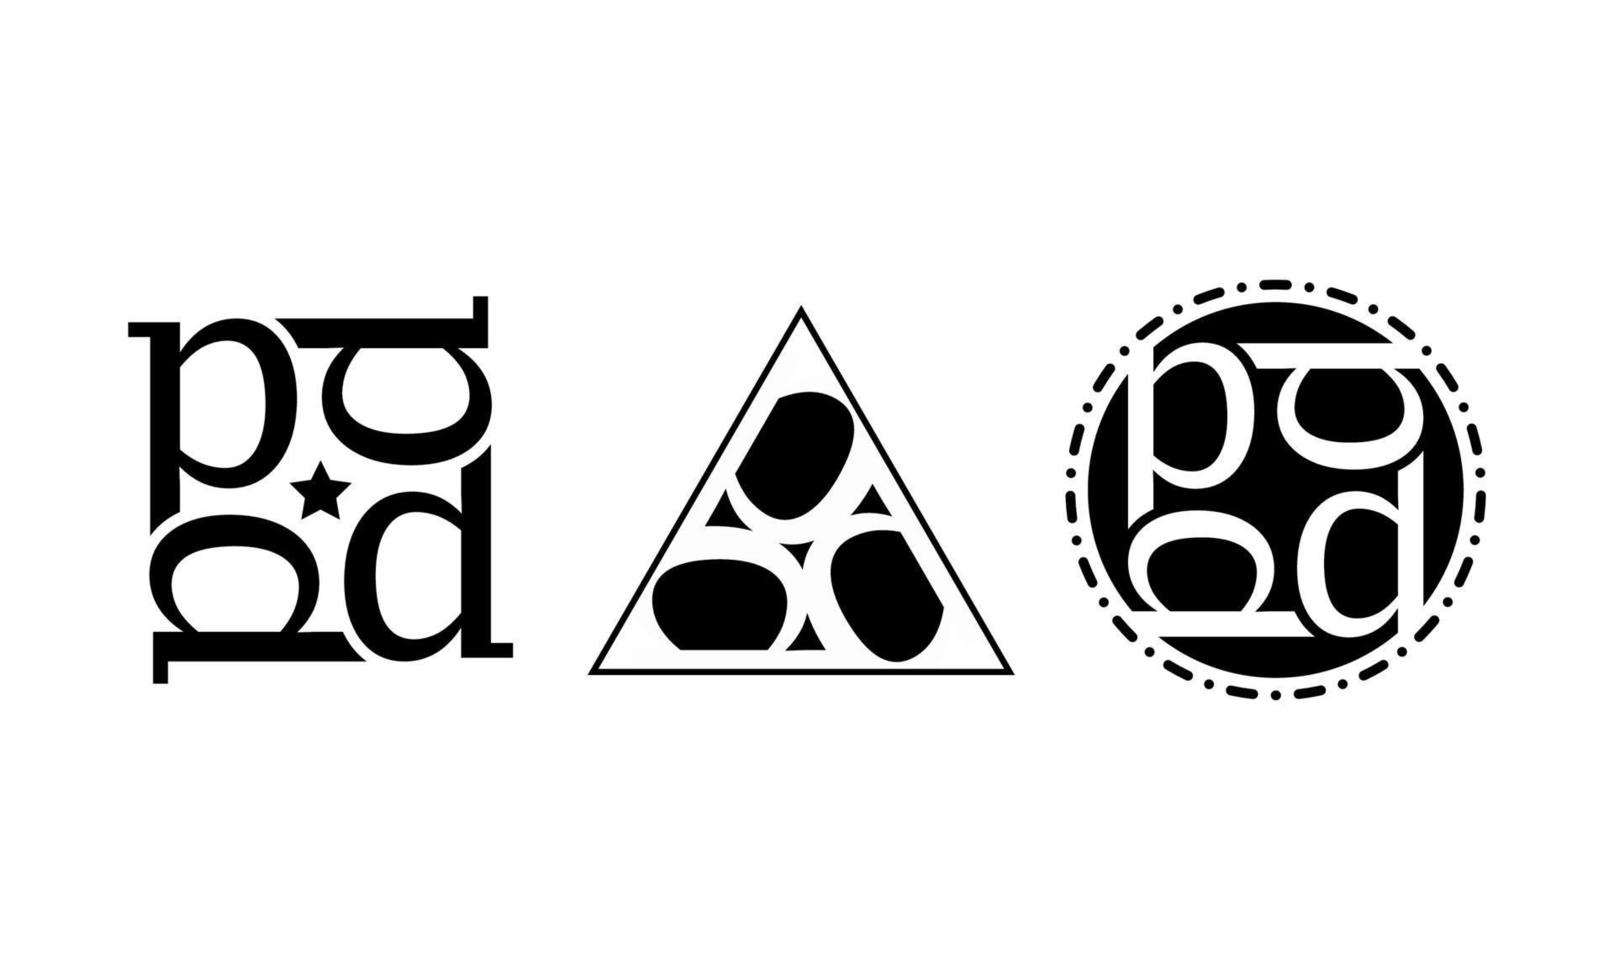 anfänglicher p kreativer Logo-Entwurfsschablonenvektor vektor